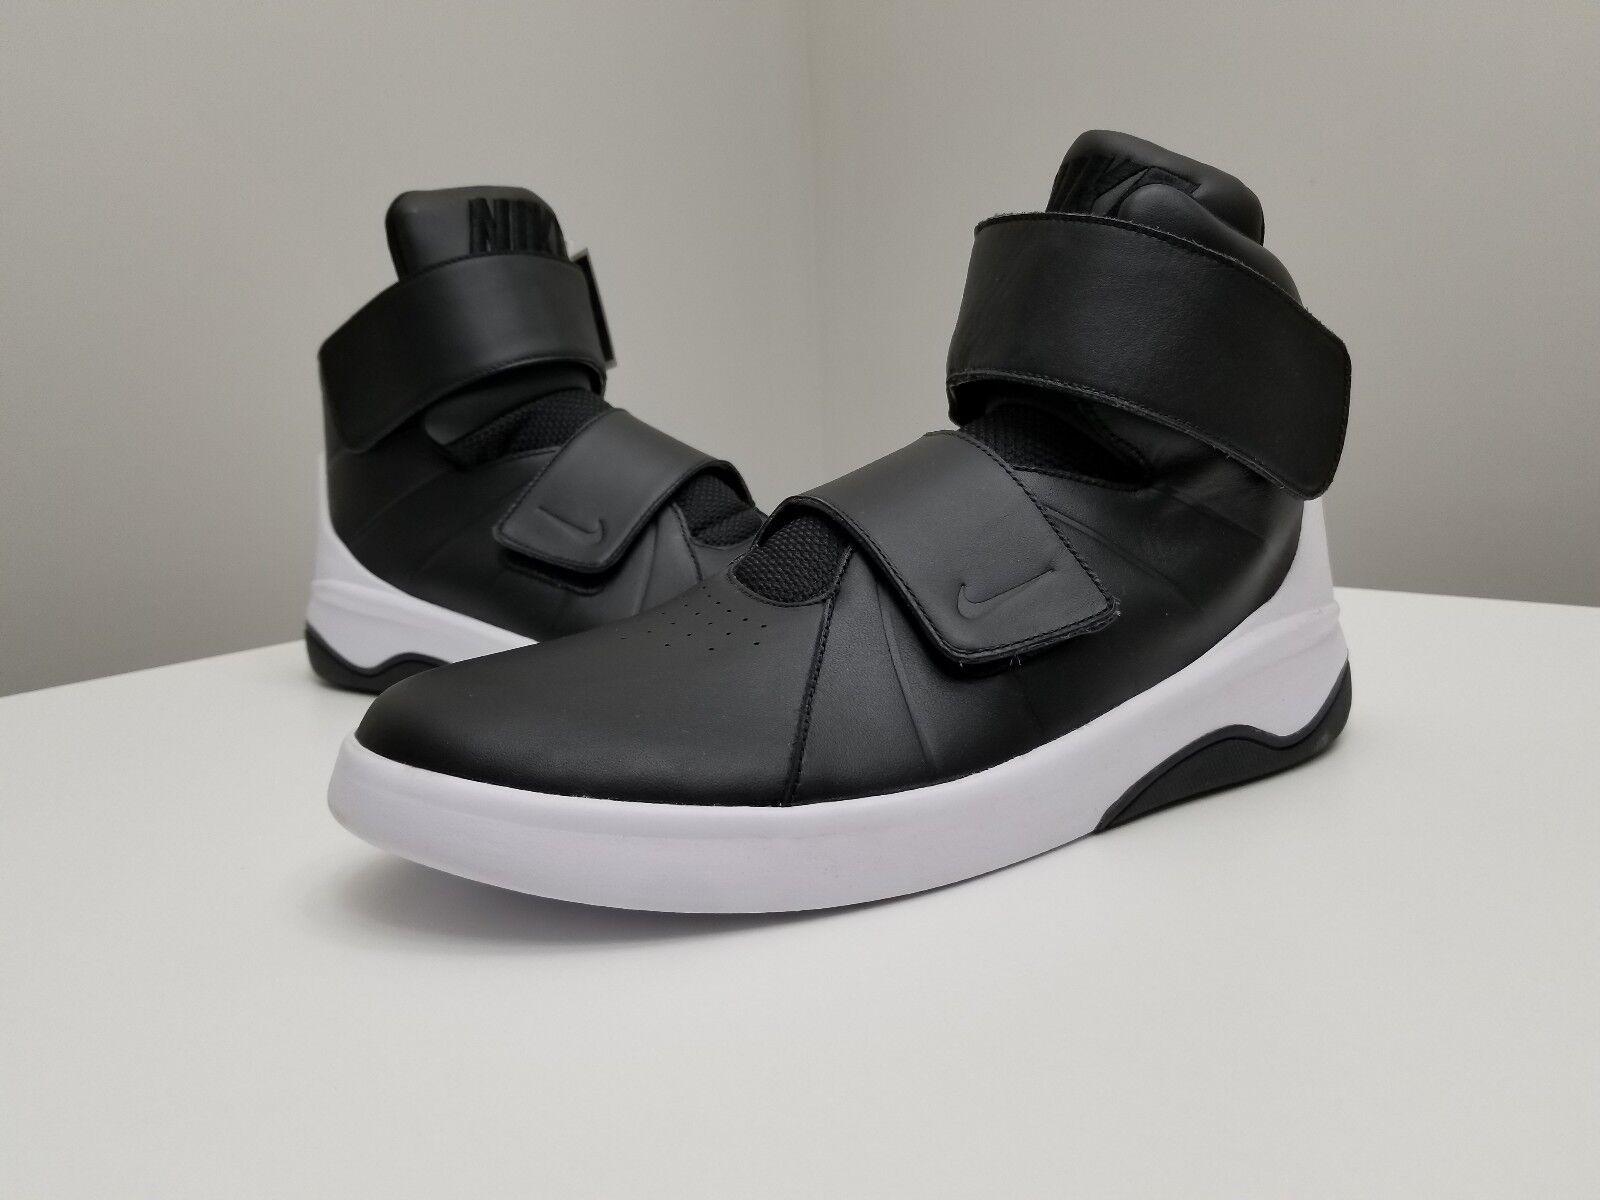 NEW NIKE MARXMAN Casual Hi Top shoes SZ 11 Black White 832764-001 westbrook